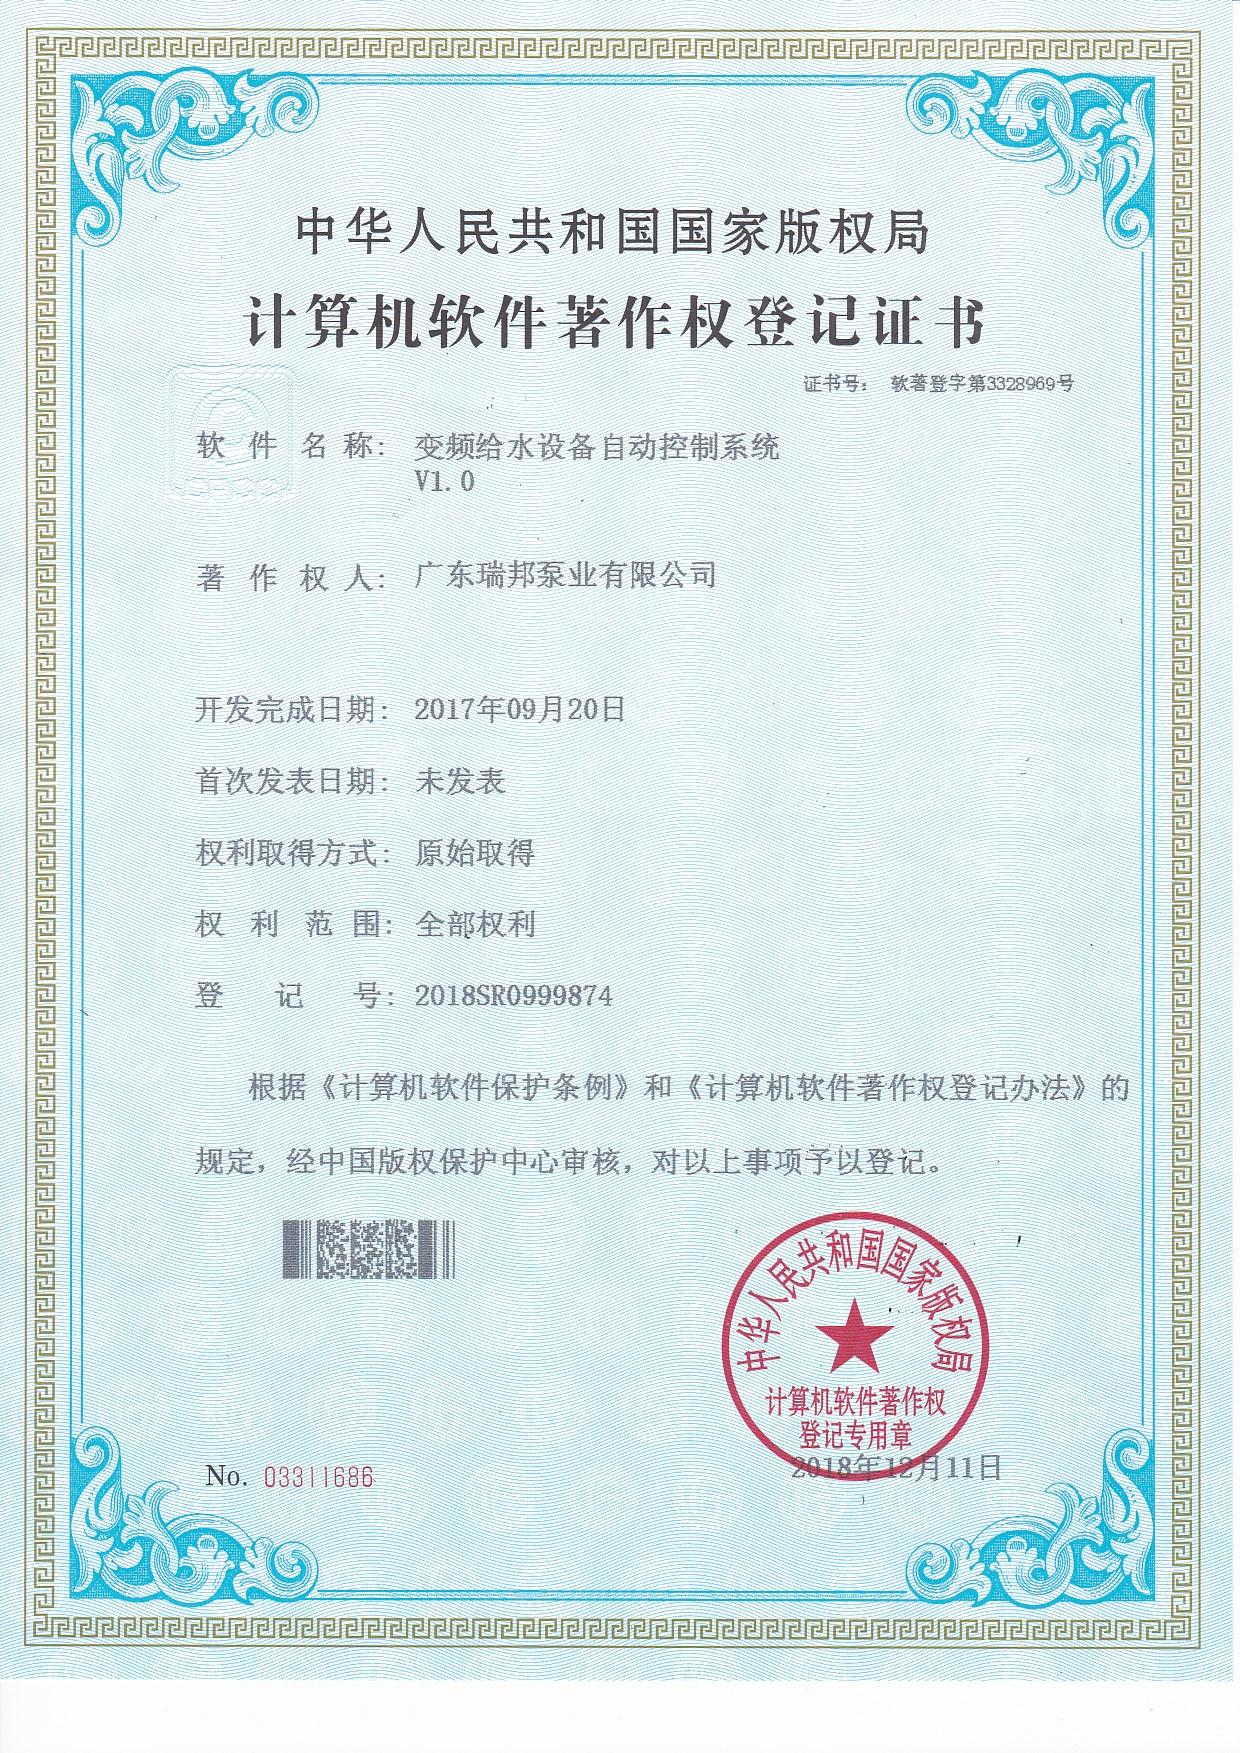 丝瓜app专利证书-3ddd302c758fe4a9a95bc19f94ff221